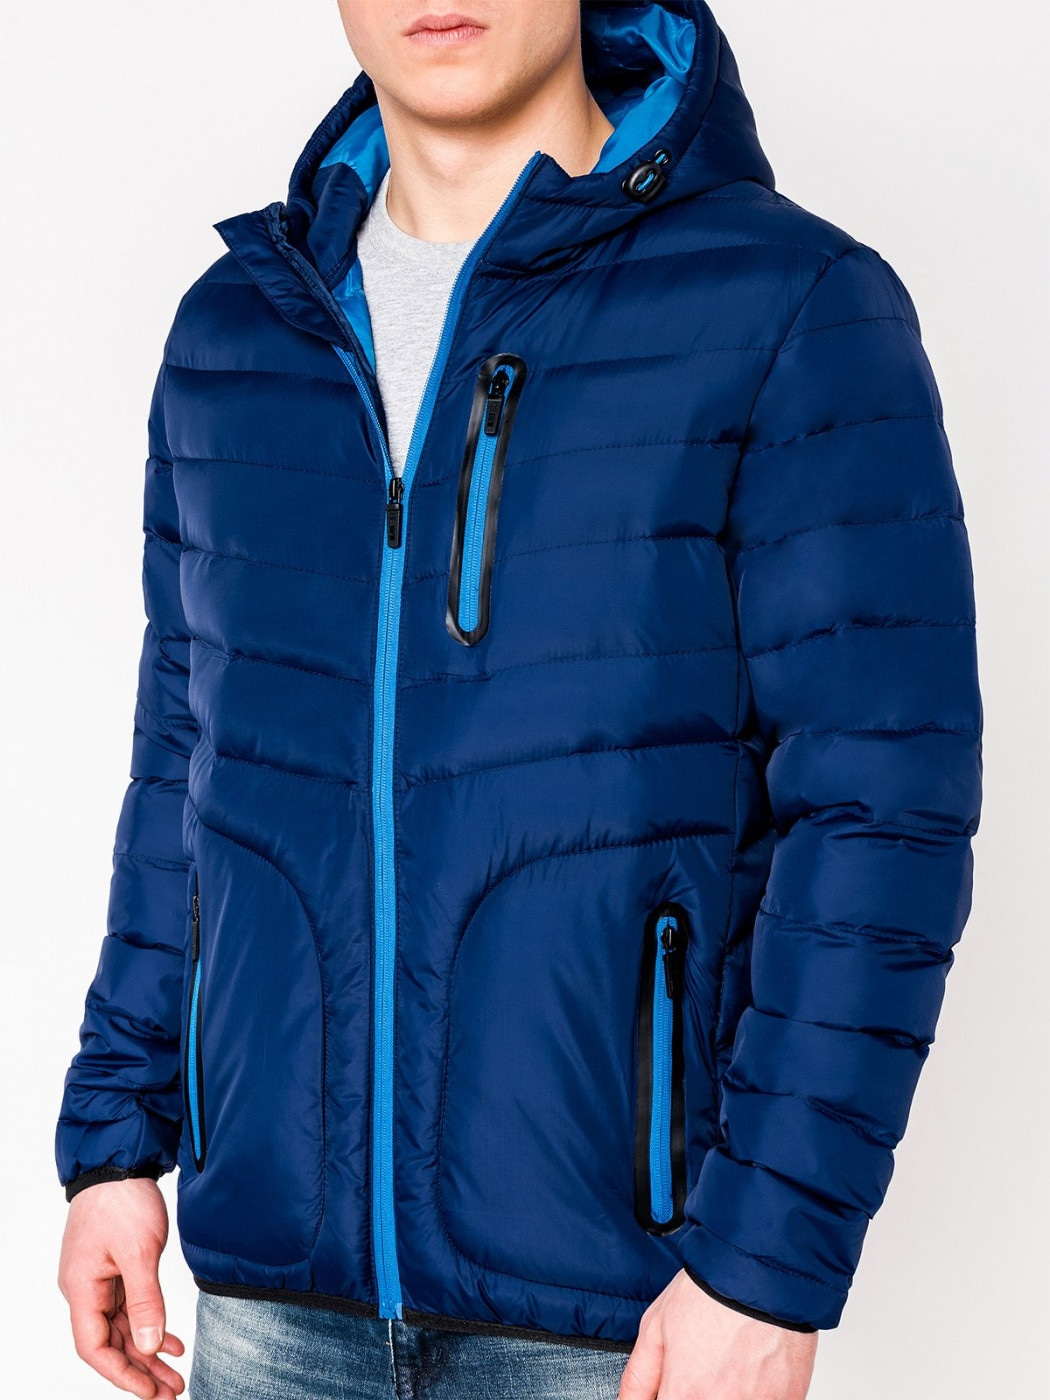 Moška jakna  Ombre C356